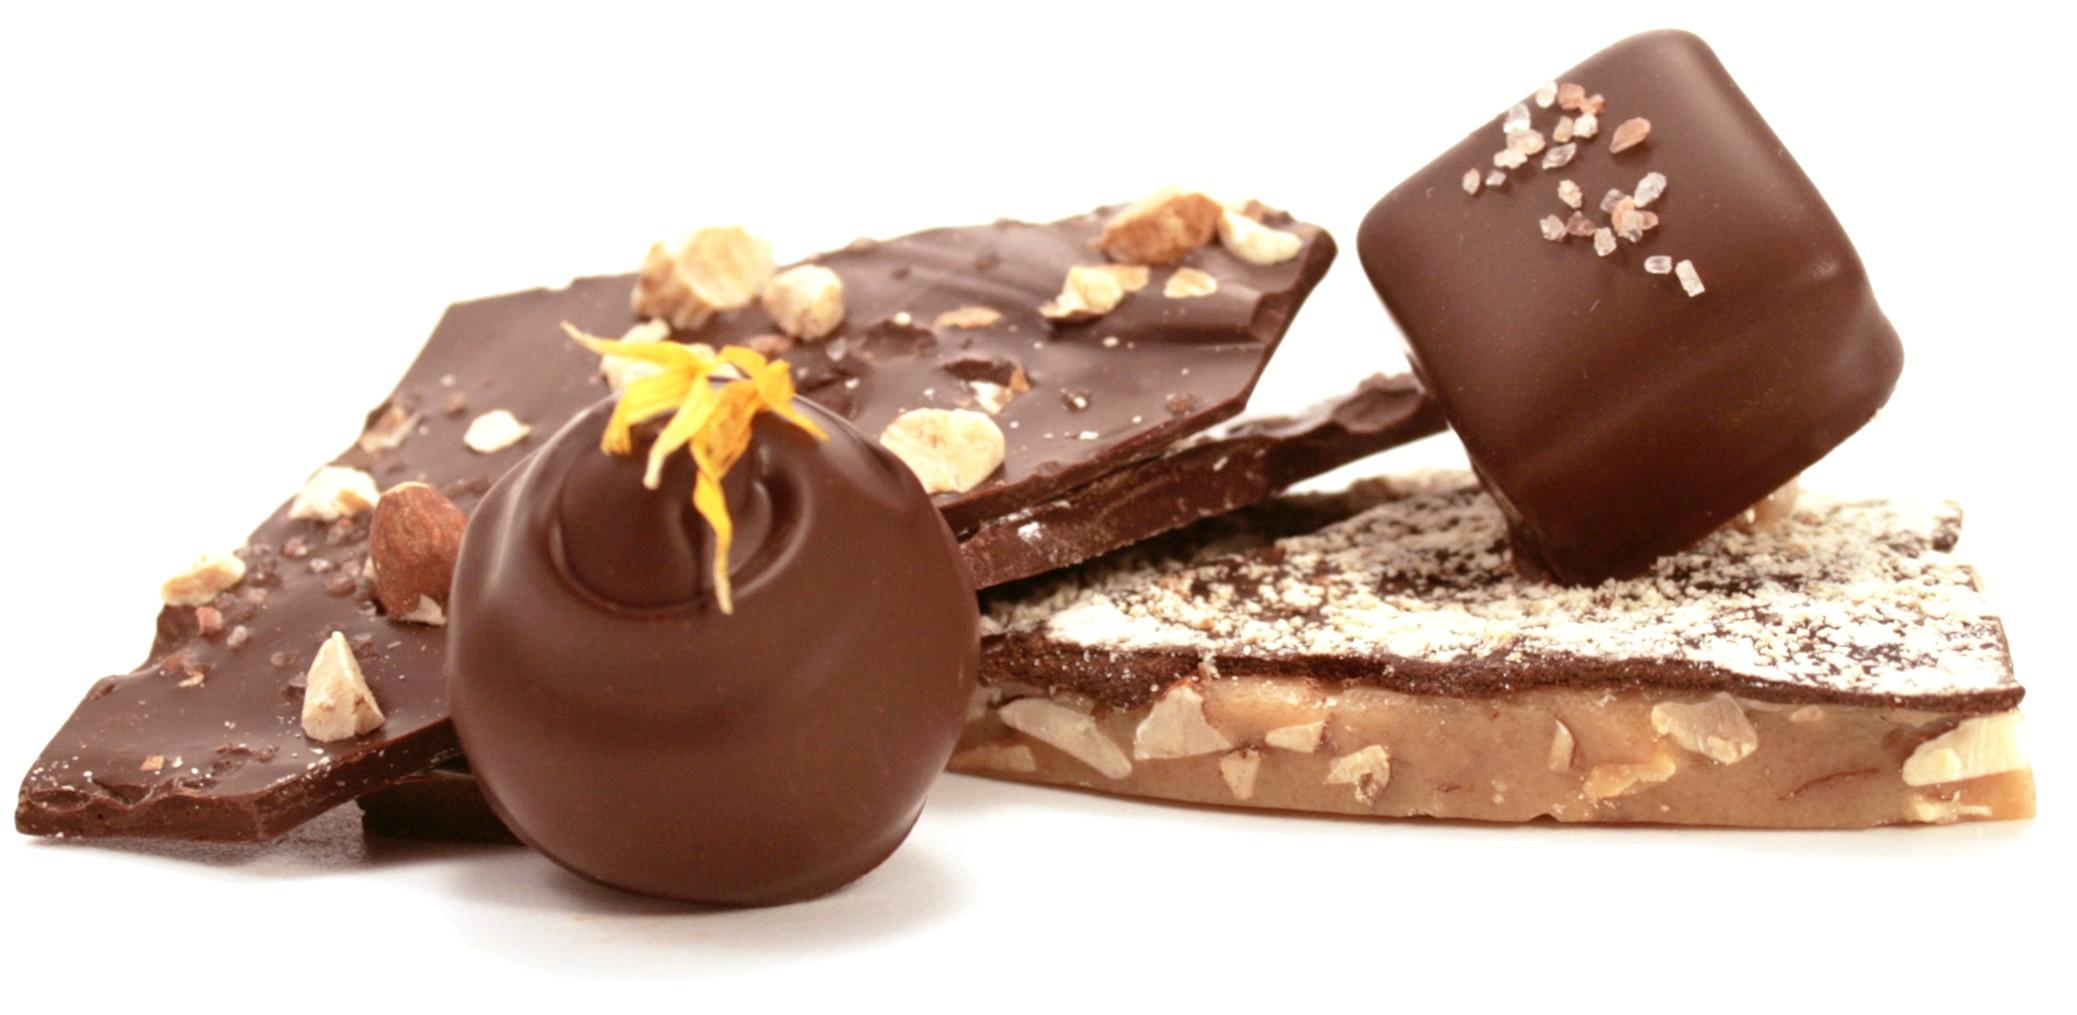 Allison's Gourmet Fair Trade Chocolates, $52